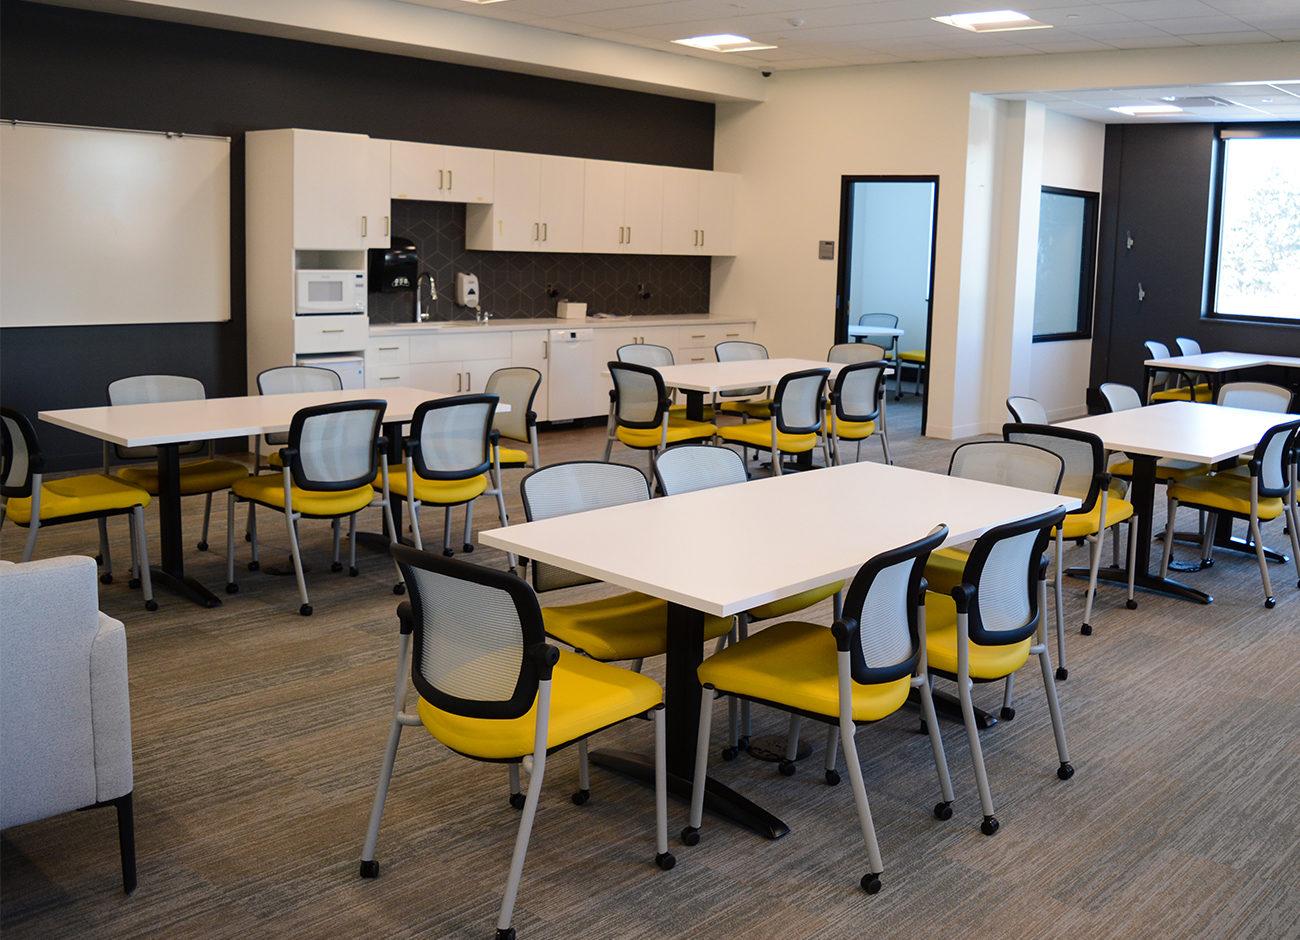 Sorenson classroom